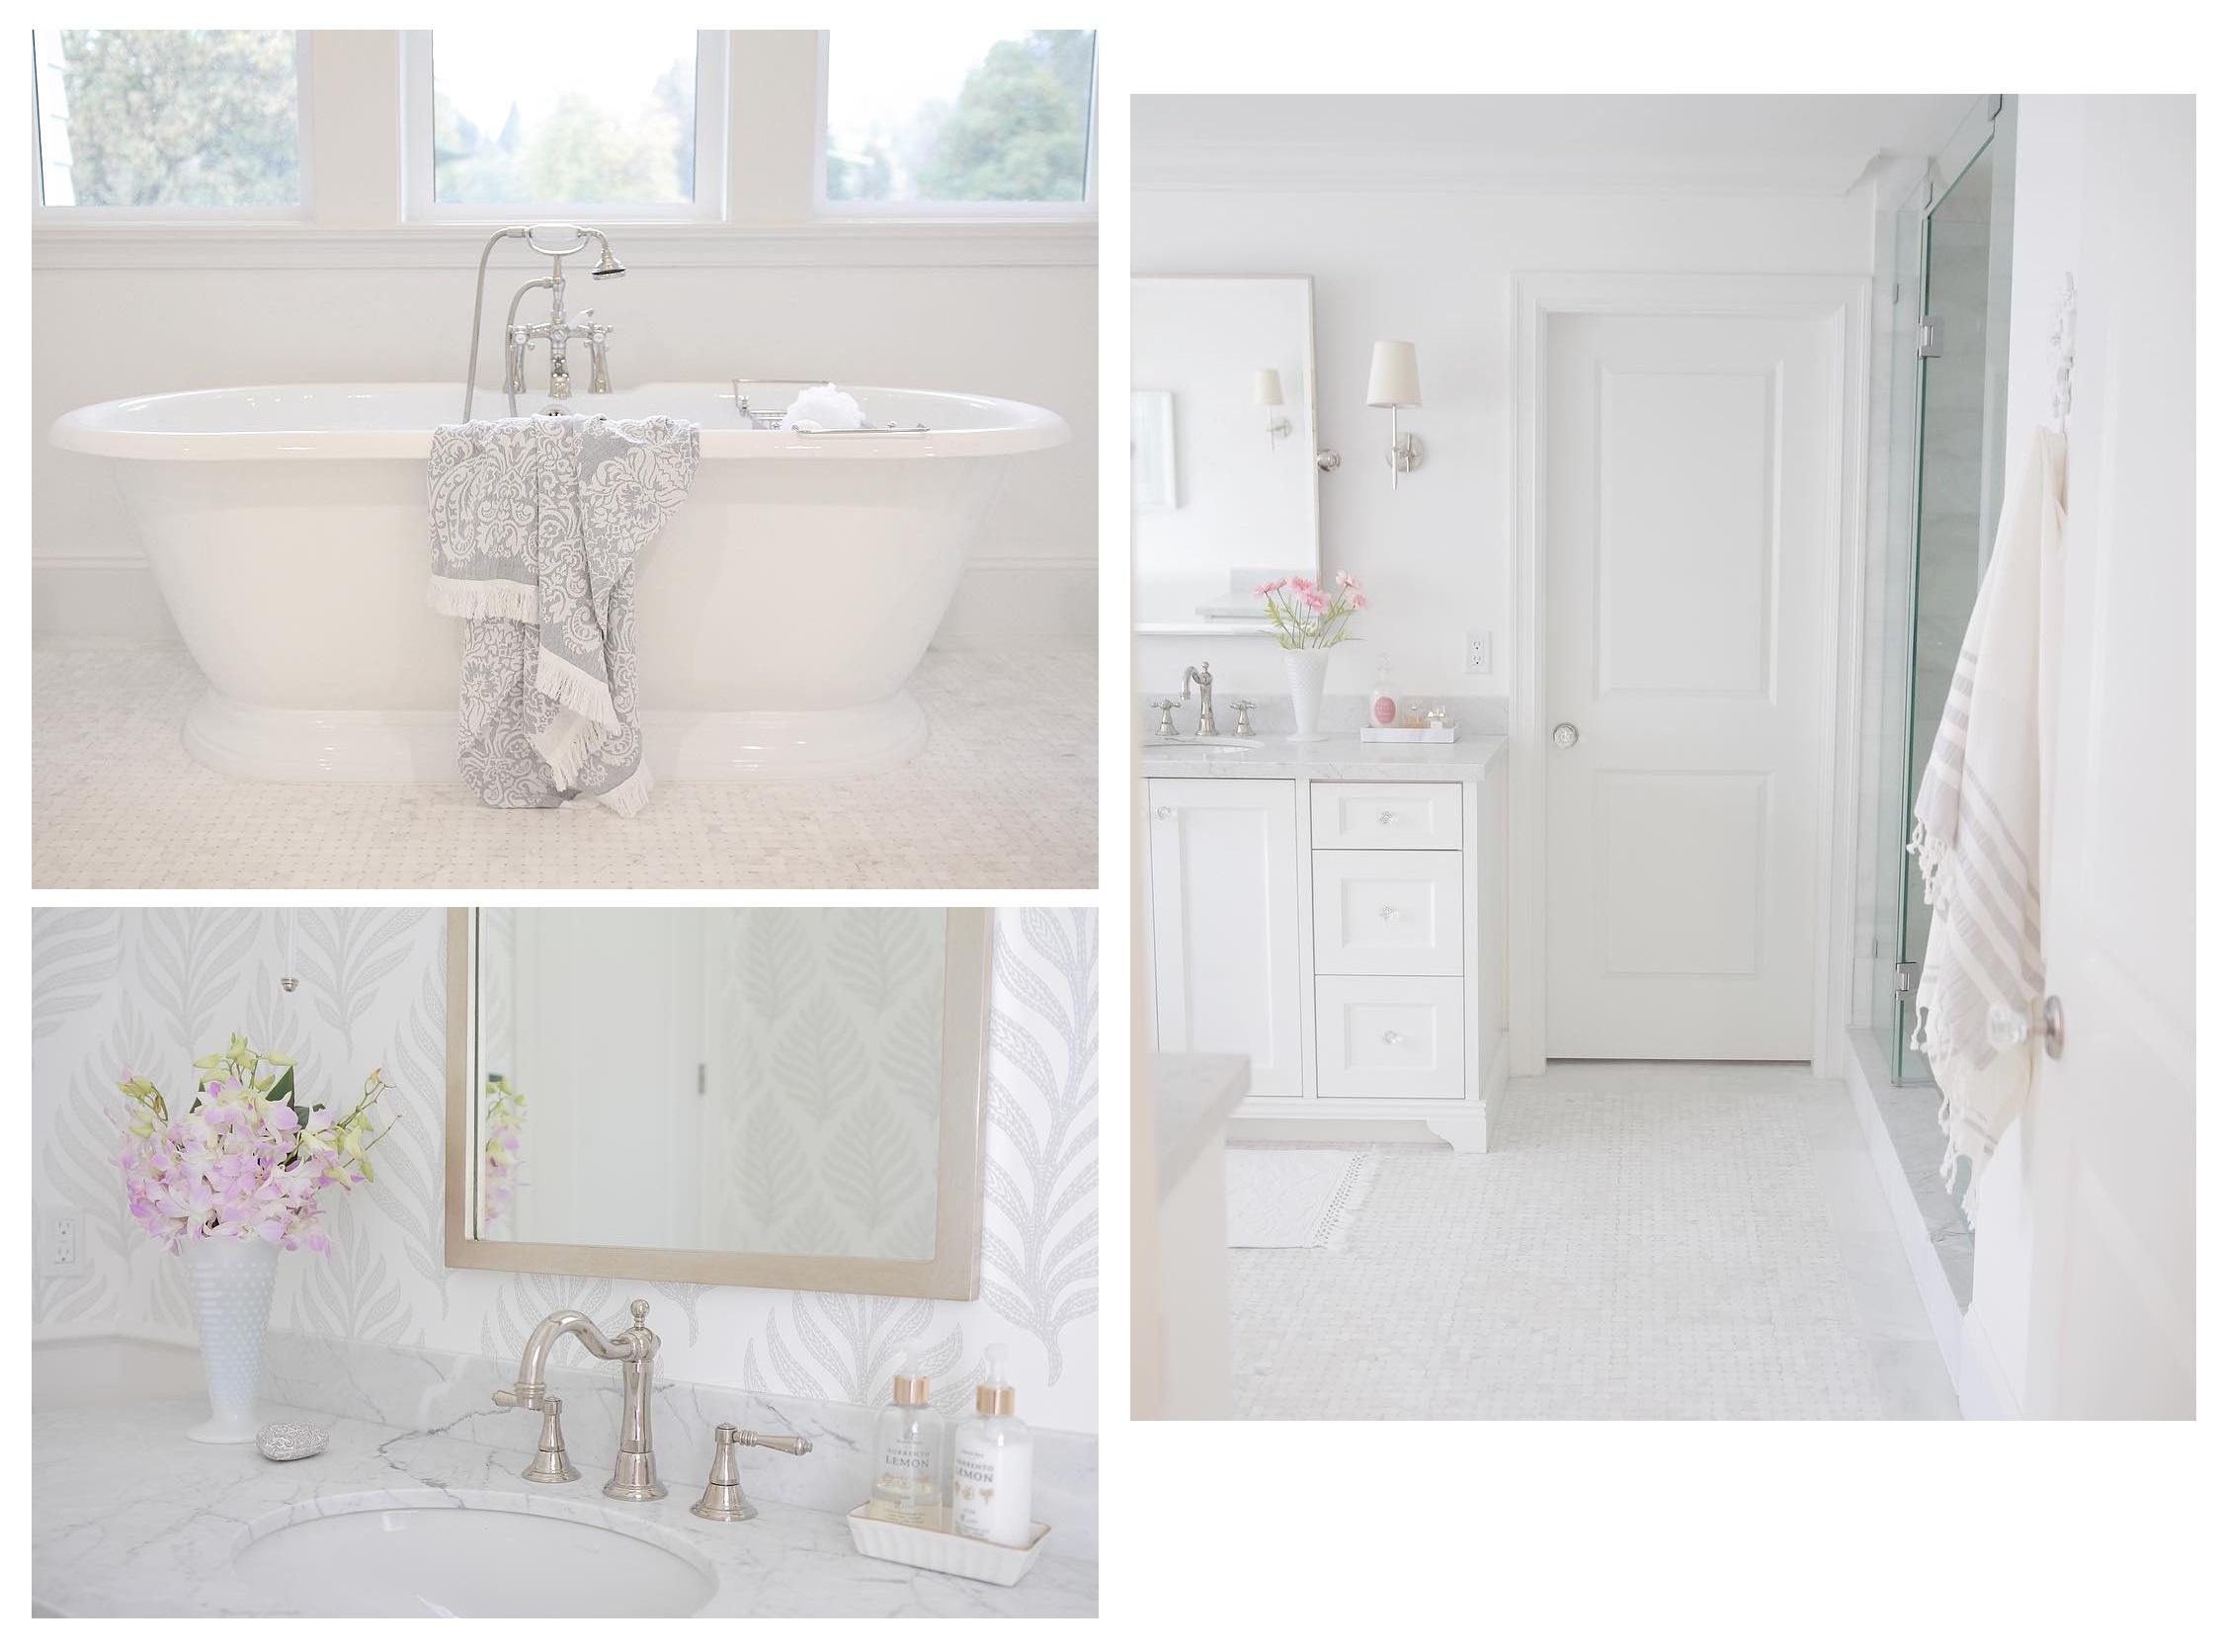 jshomedesign - bathrooms - biały dom